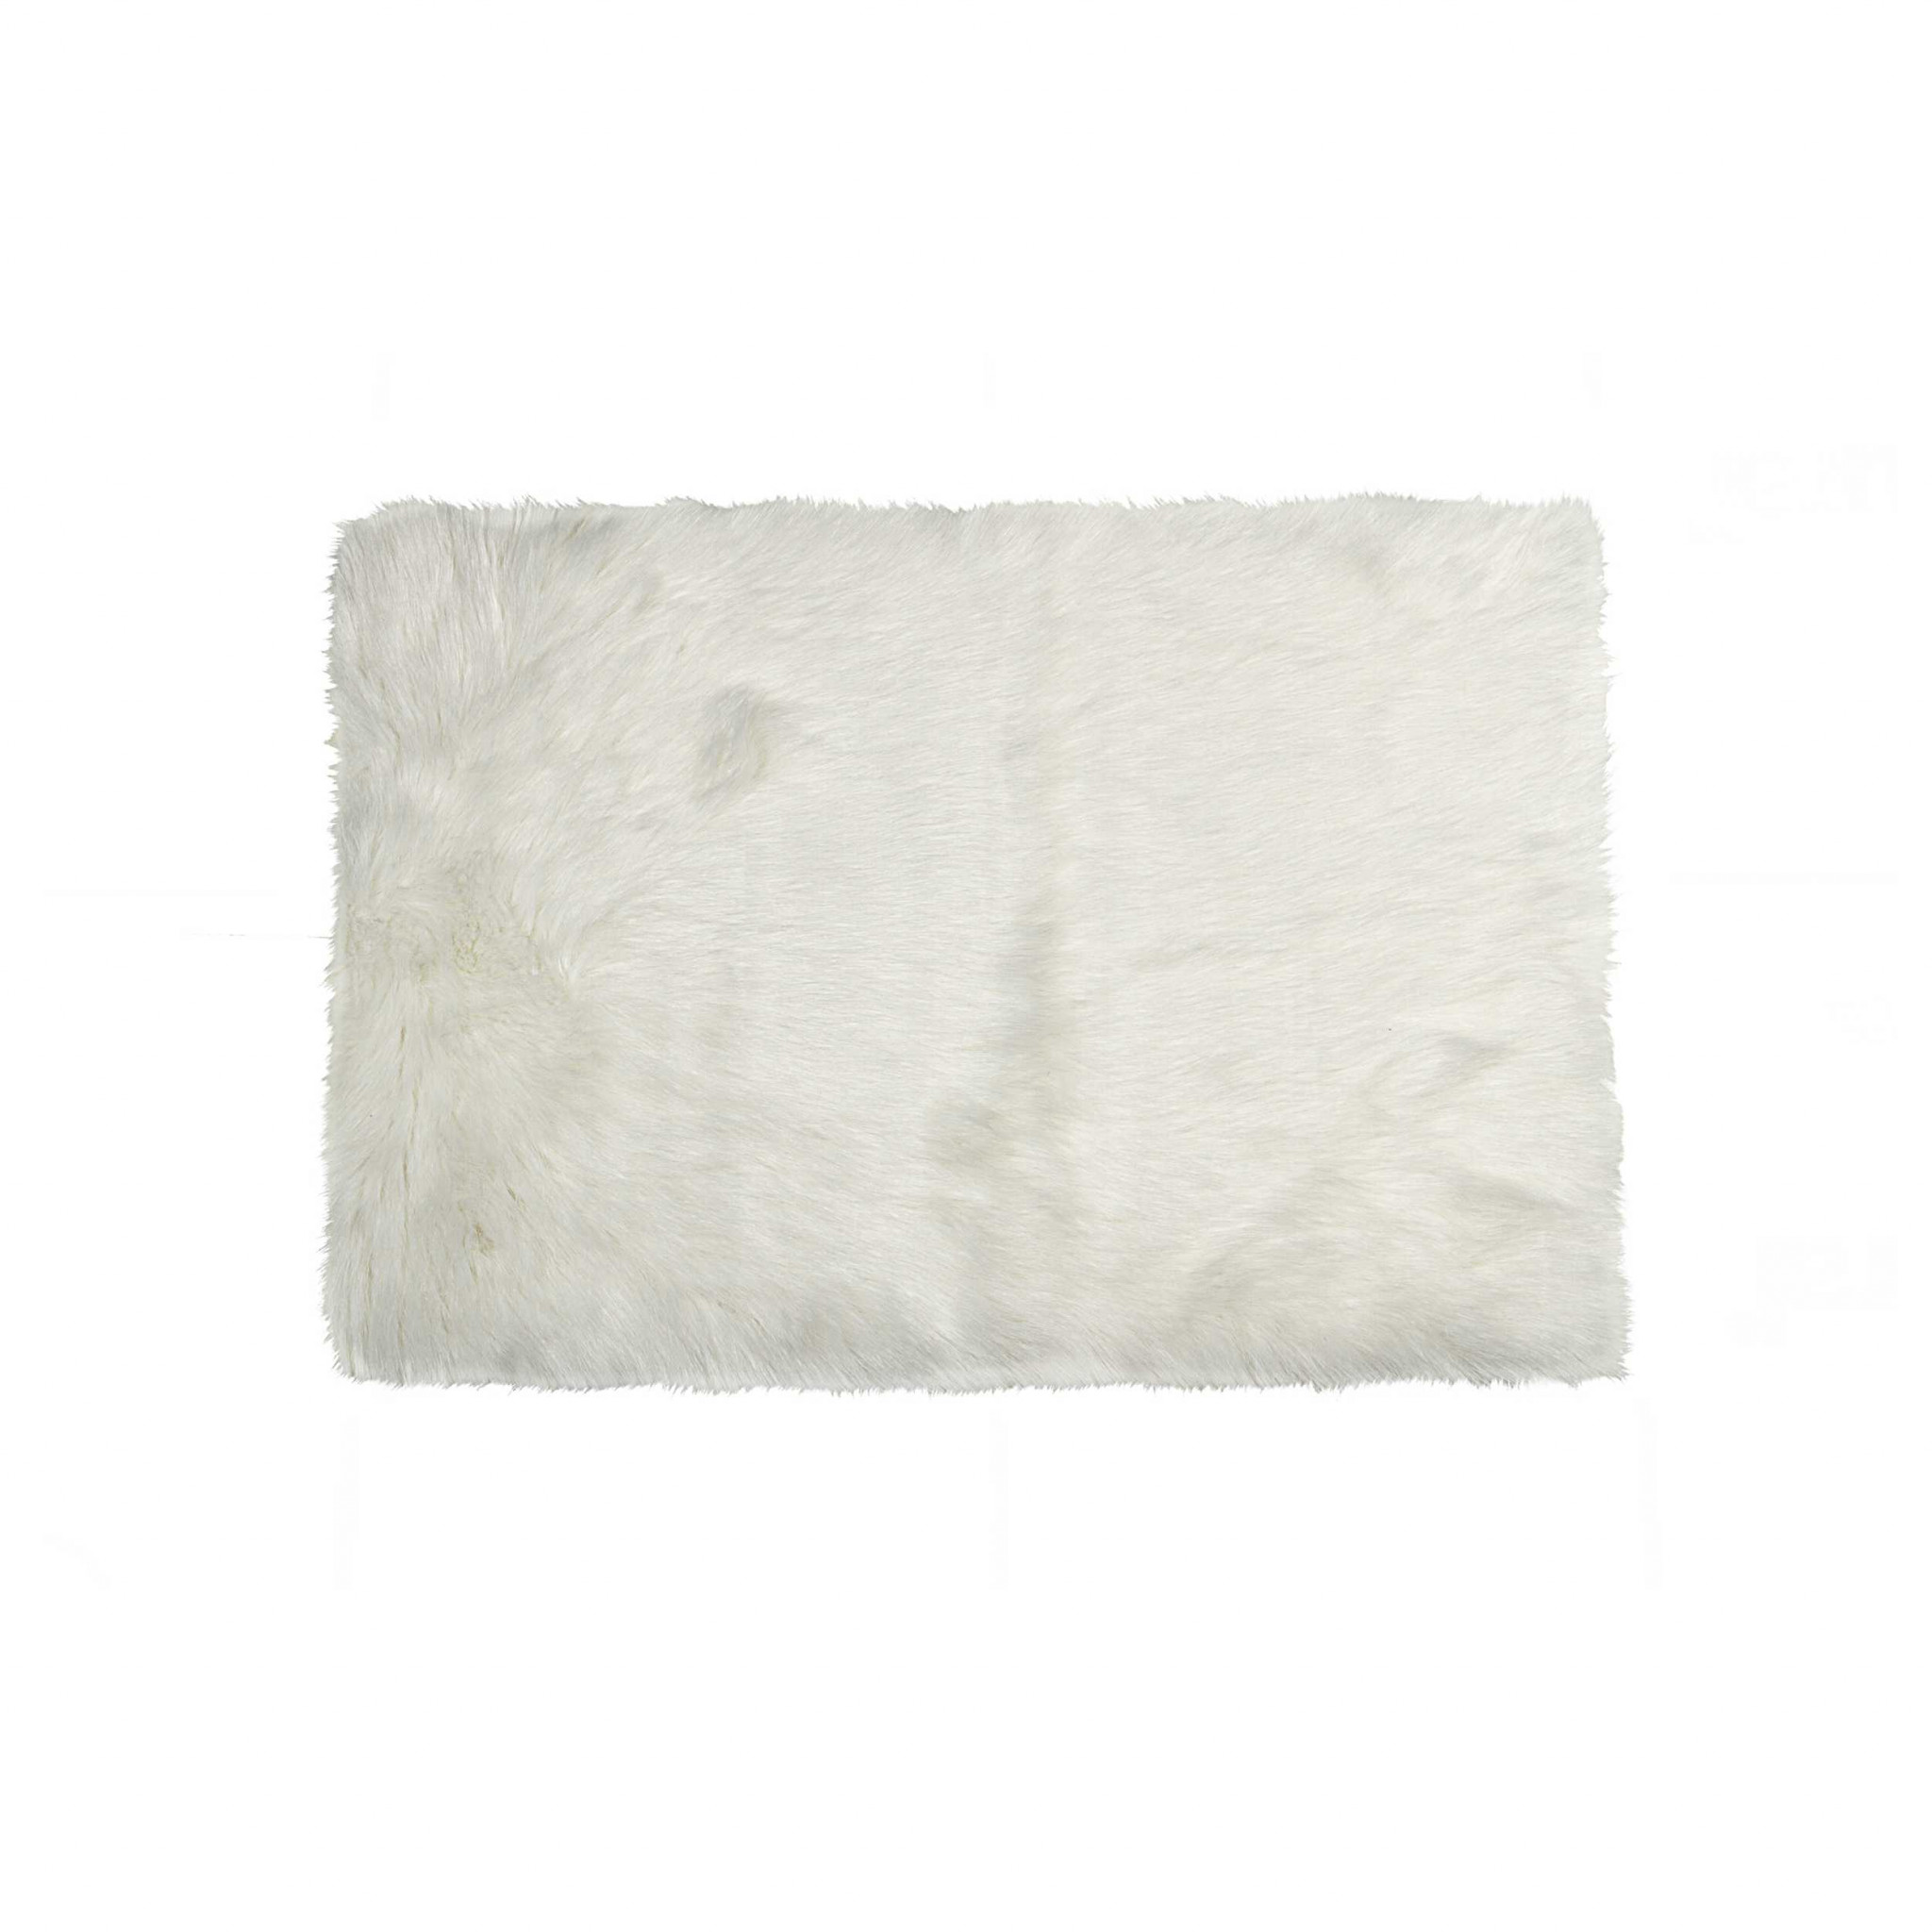 3' X 5' Off White Rectangular Faux Fur Area Rug